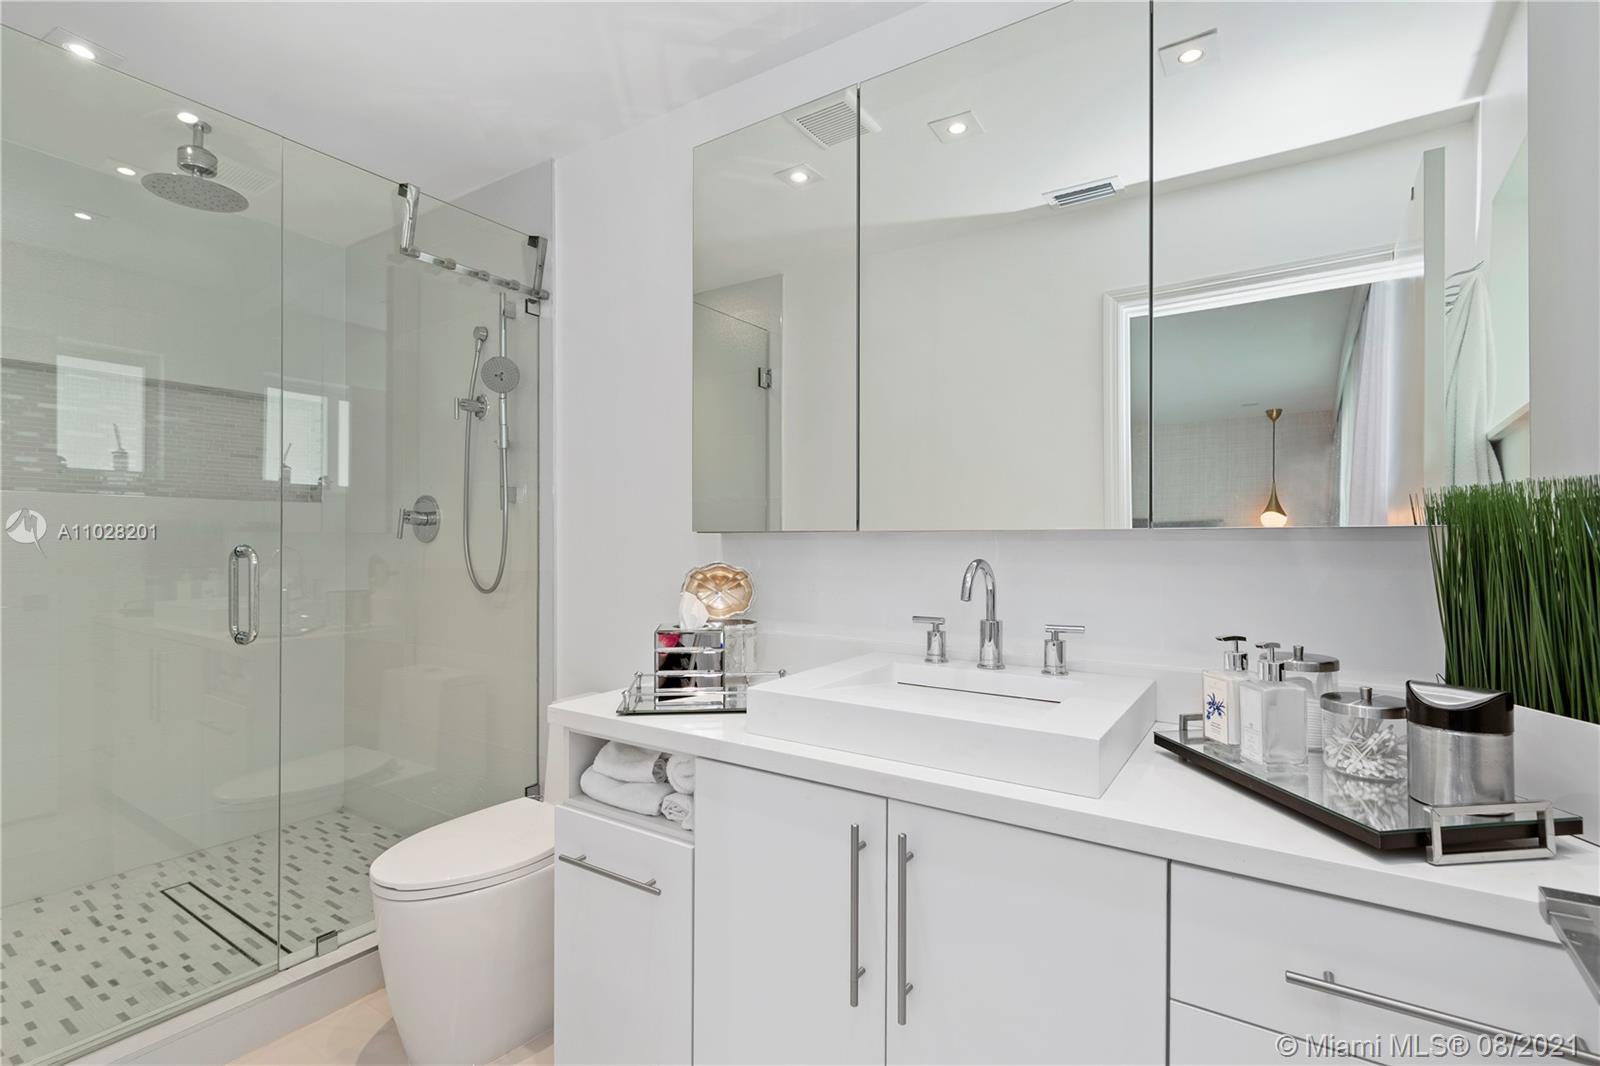 Gorgeous master bathroom with frameless shower door and rain shower.